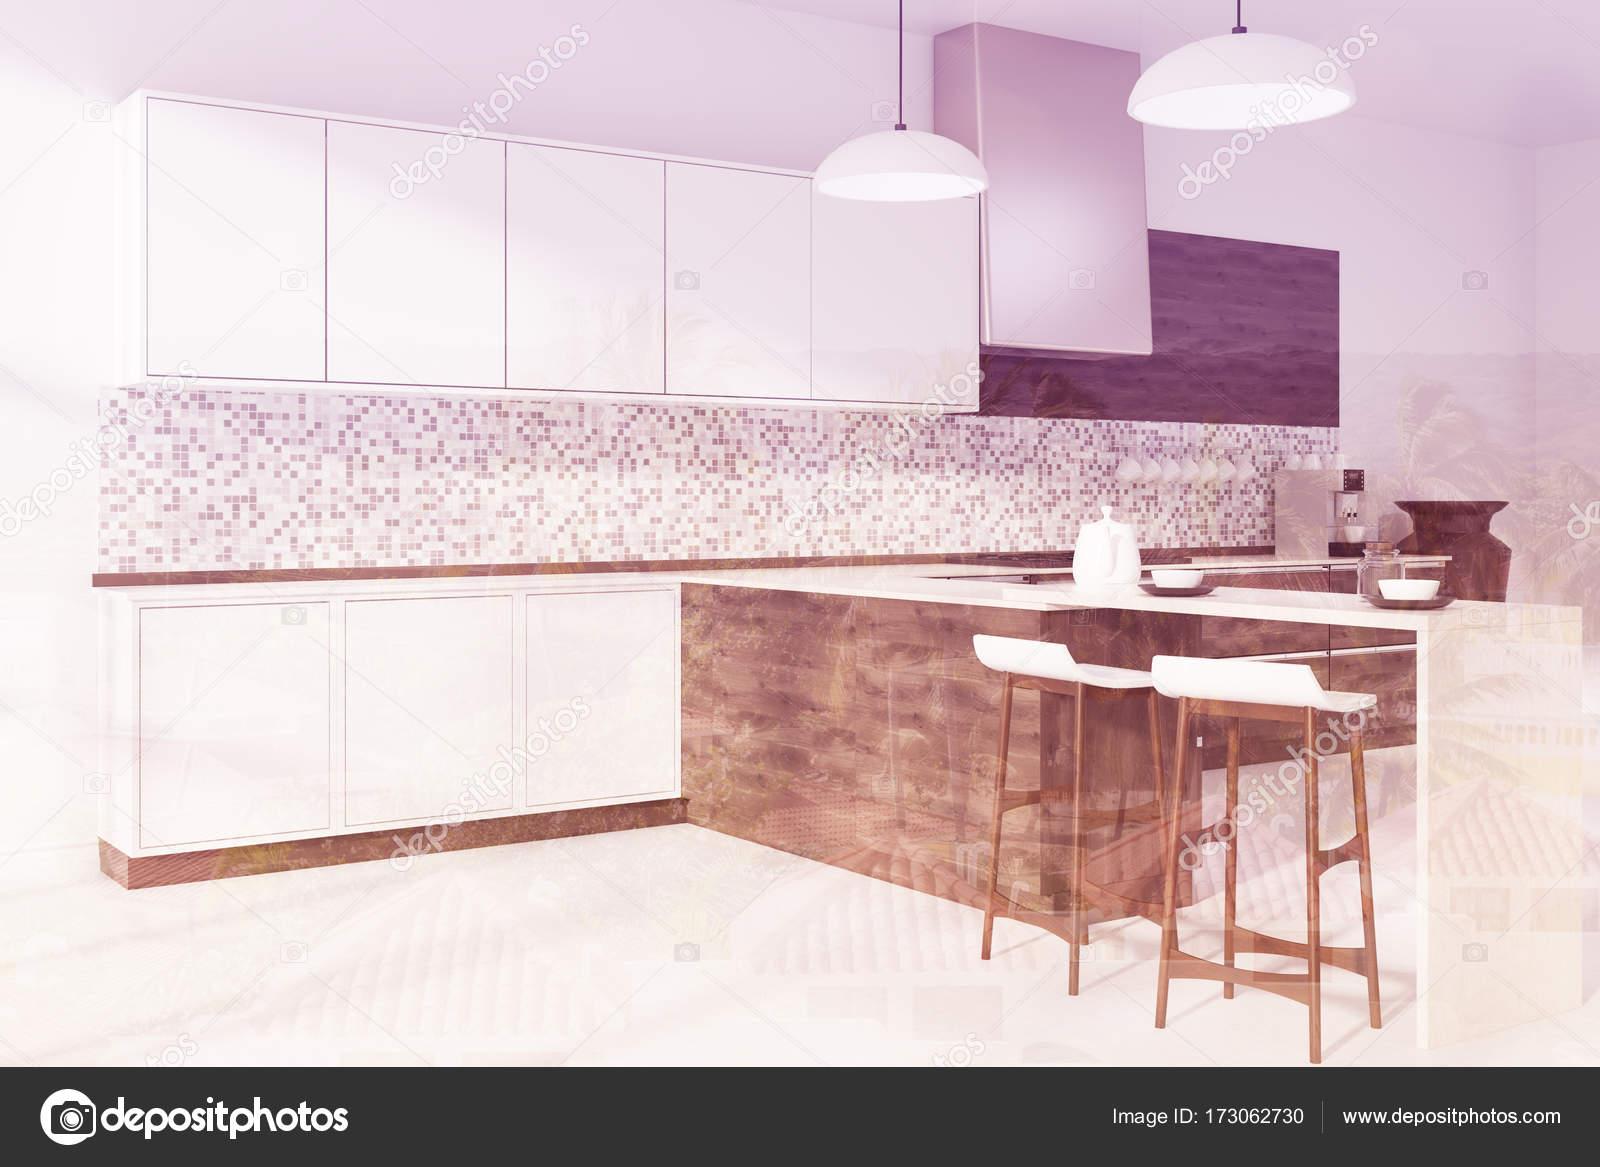 Mosaik Küche, dunklem Holz bar Seite getönt — Stockfoto ...